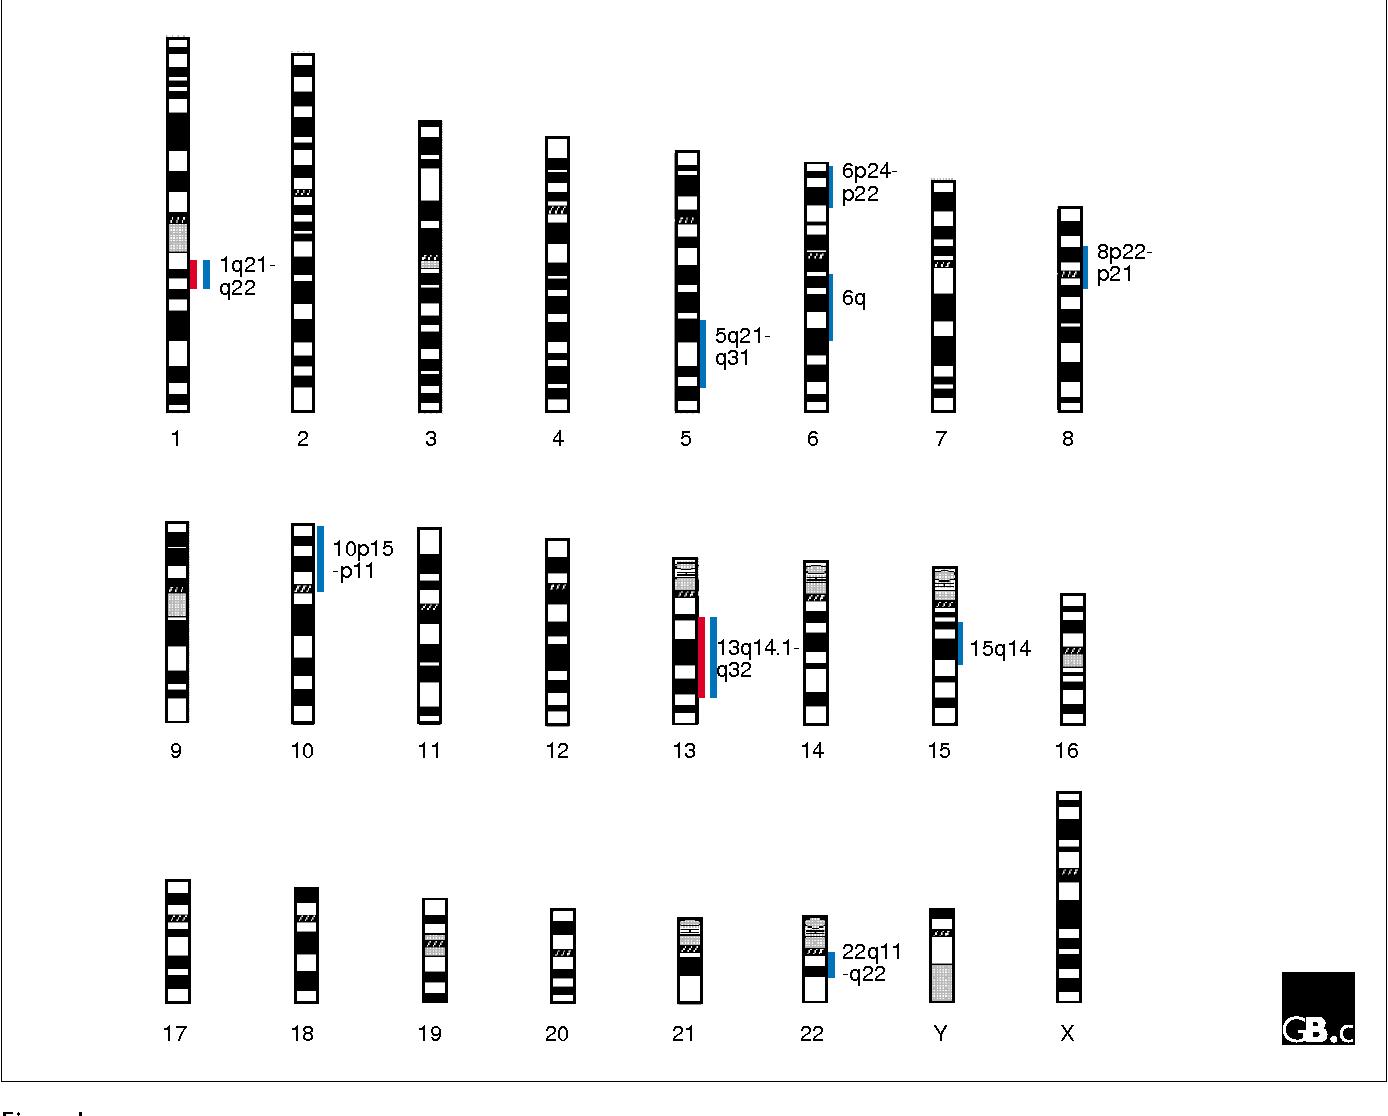 İnsanda 22 adet somatik (vücut) ve 1 adet eşeysel (seks) kromozomu bulunur.